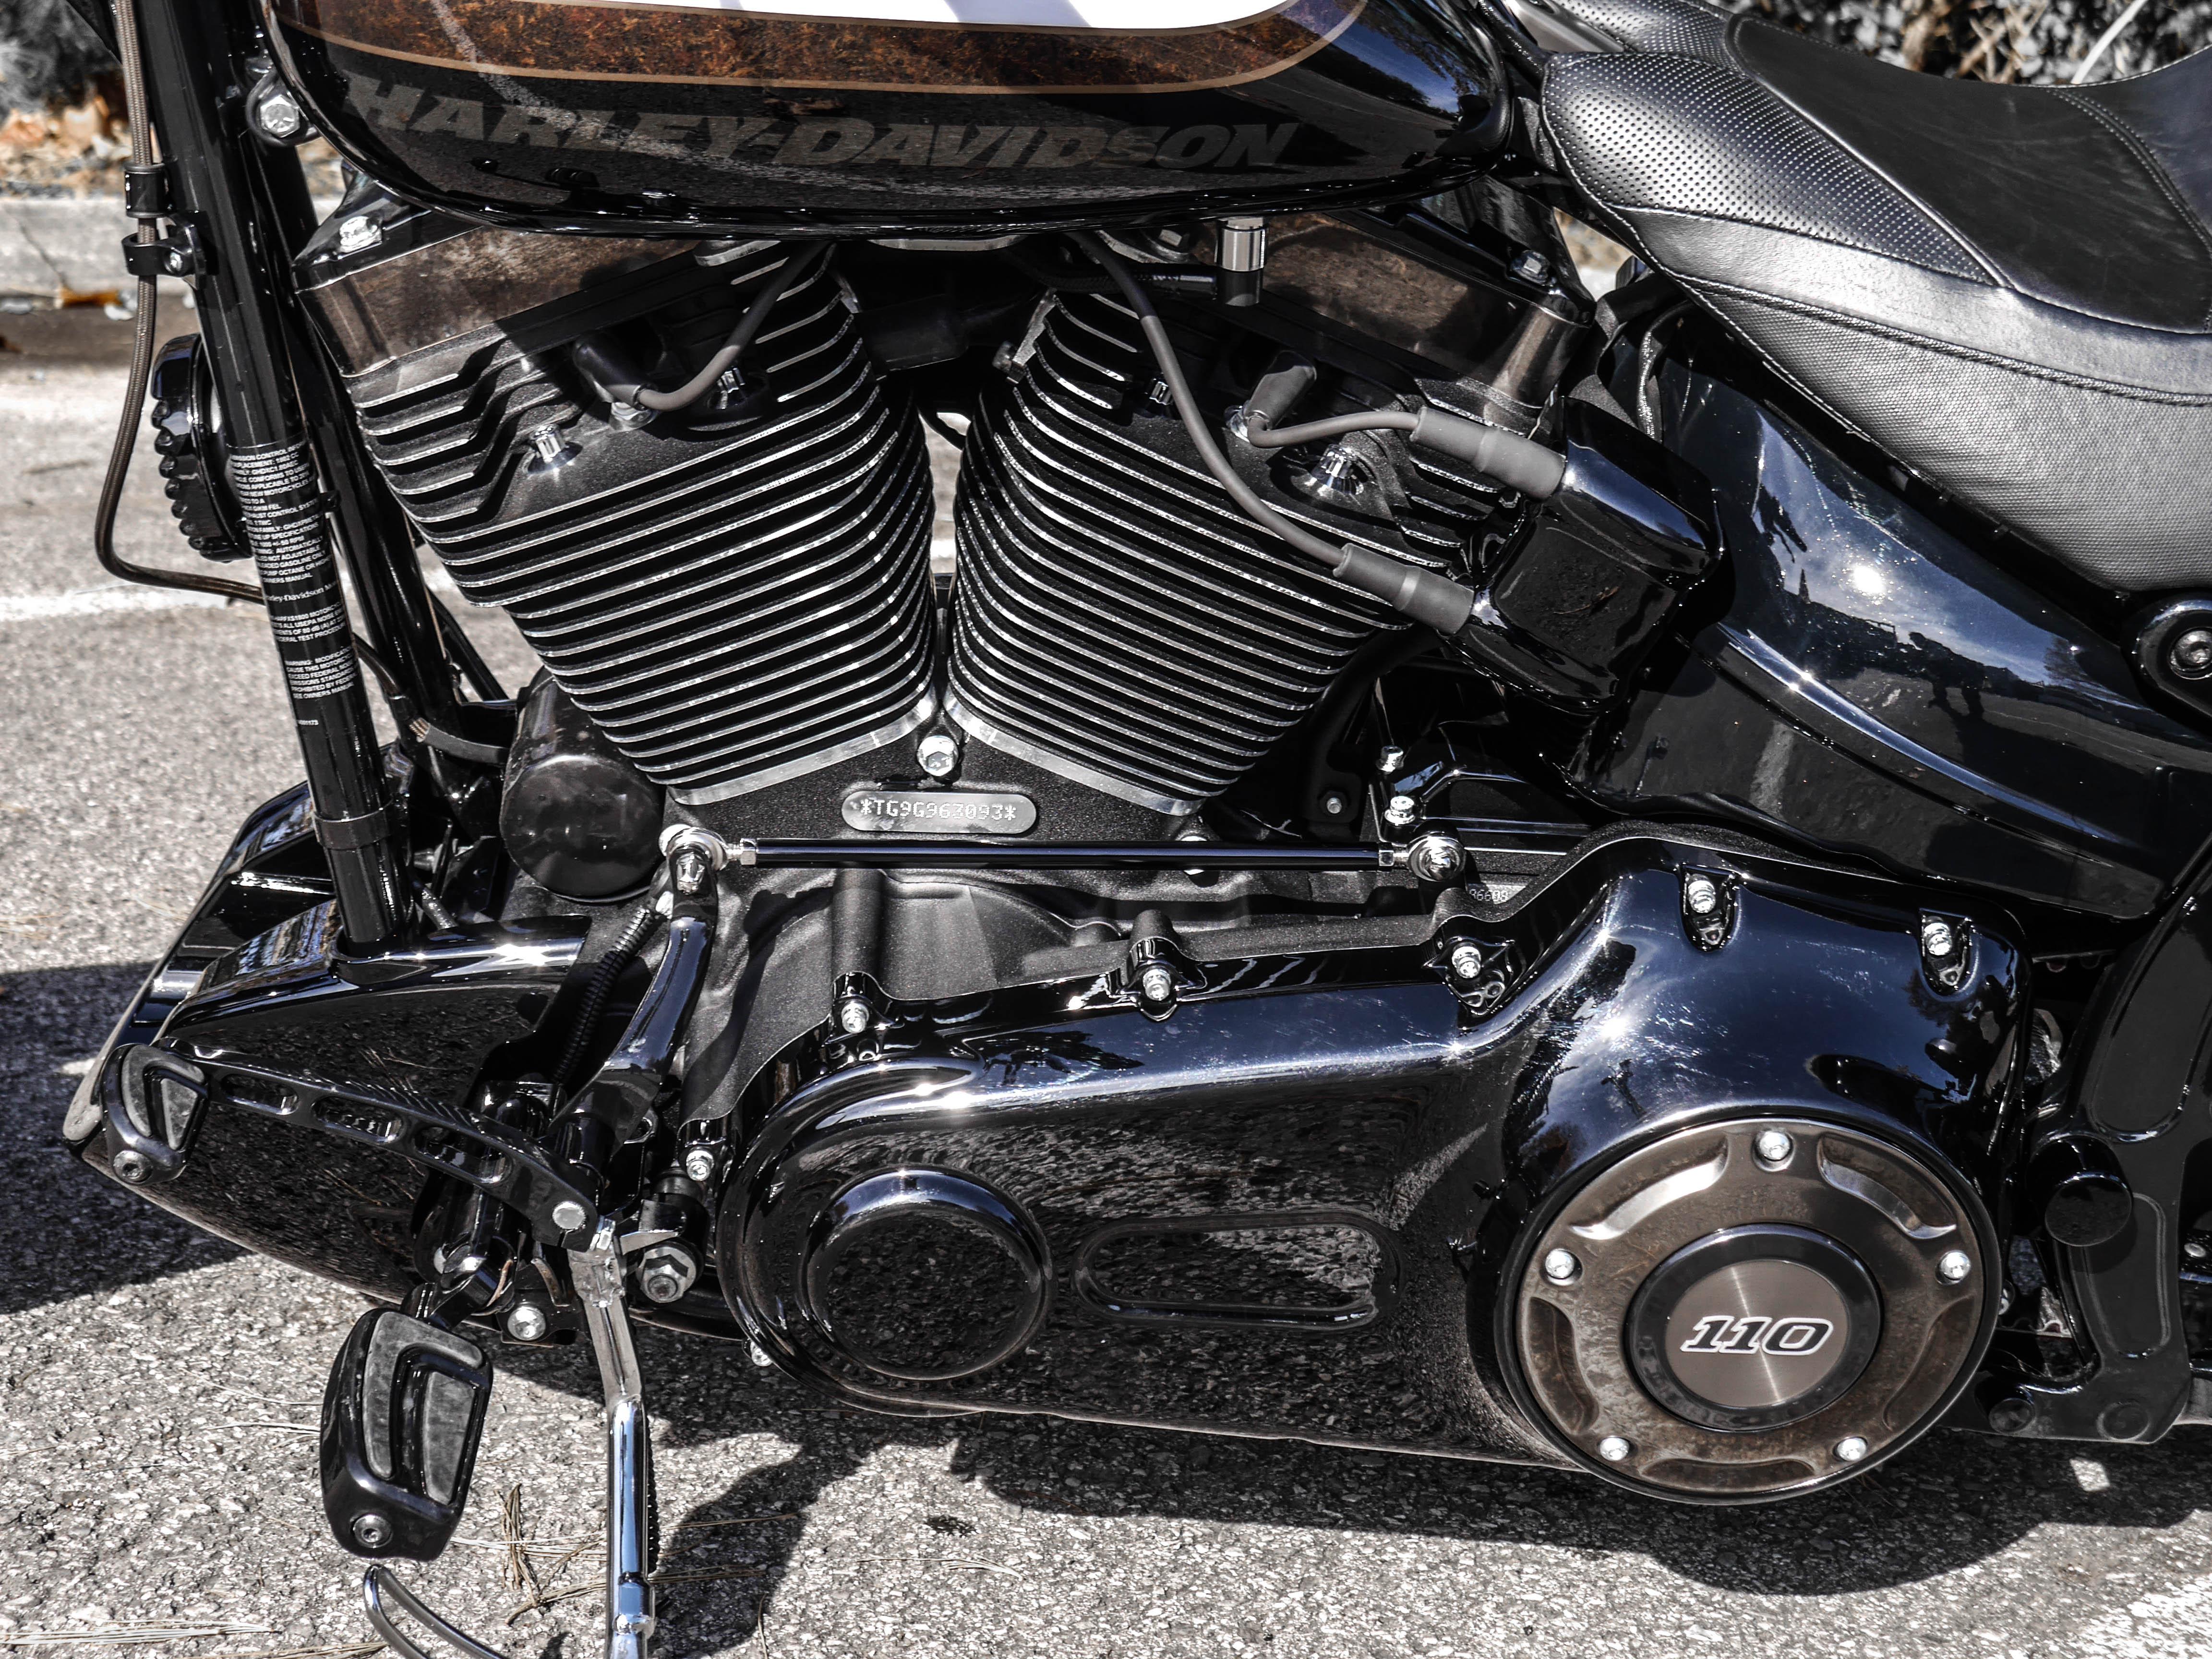 Pre-Owned 2016 Harley-Davidson CVO Pro Street Breakout